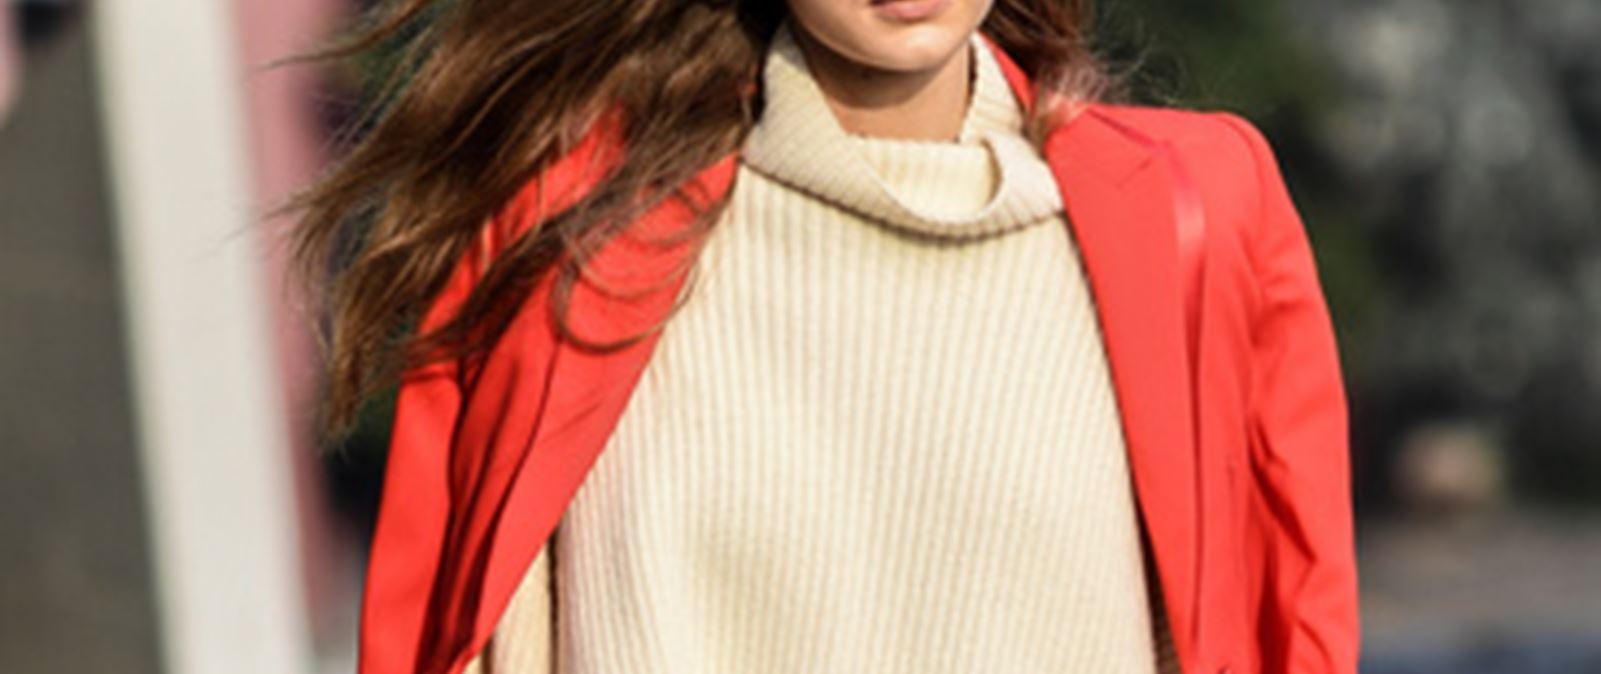 a812234b9e0a Κι όμως μπορείς να κάνεις τα φθαρμένα σου πουλόβερ να μοιάζουν σαν  καινούρια χωρίς κόστος